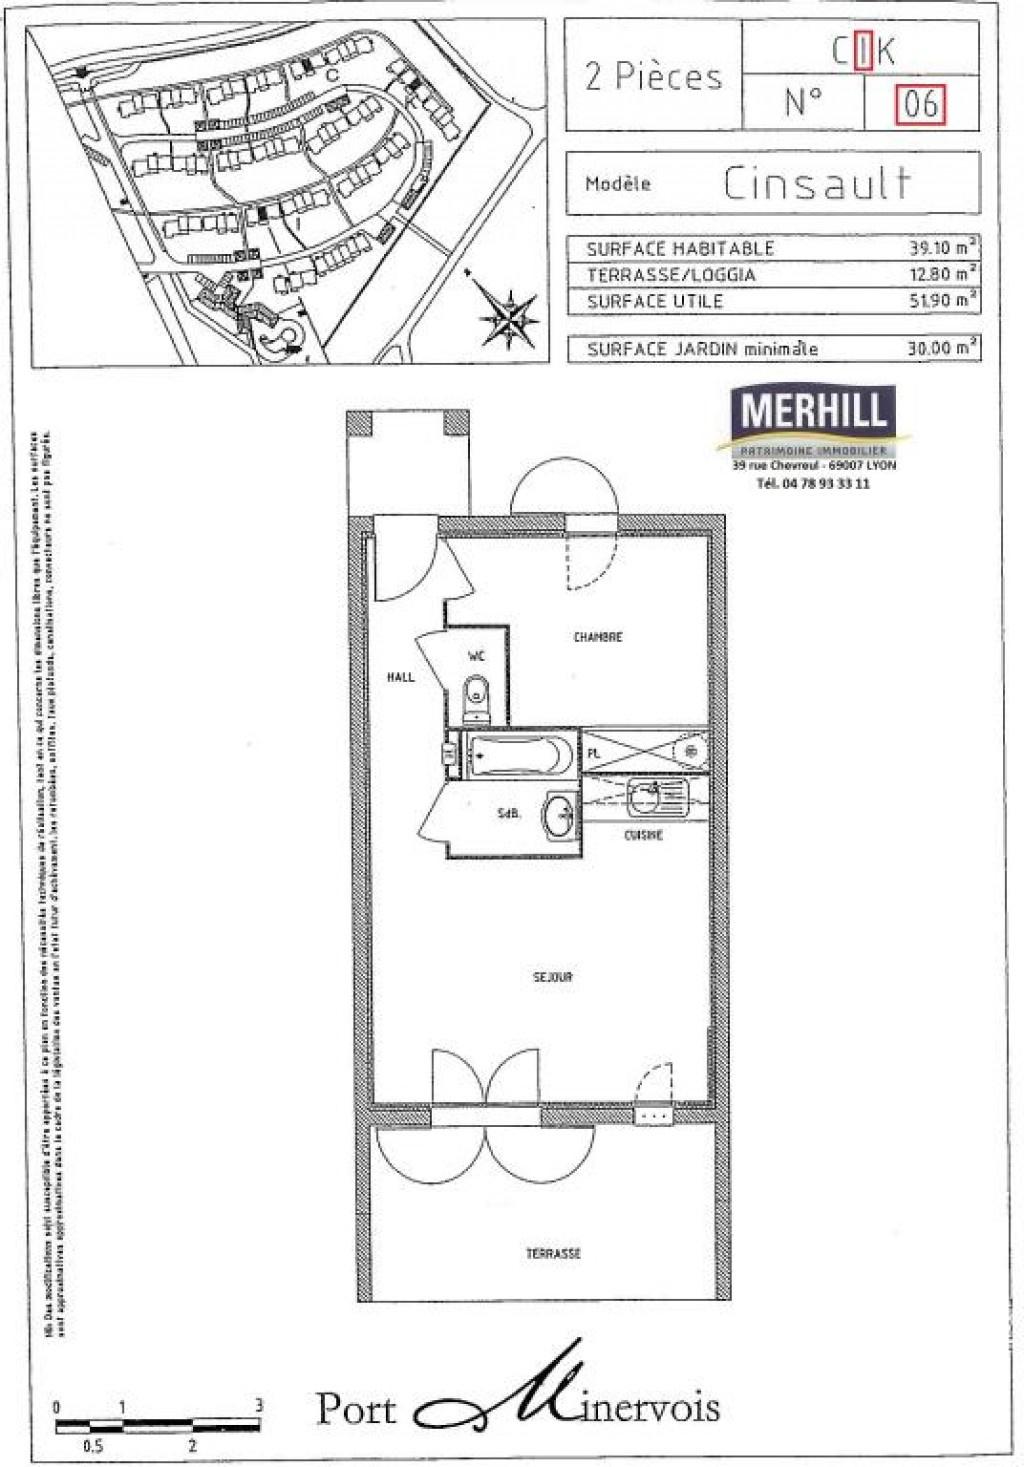 PORT MINERVOIS - Lot I 06 - Plan